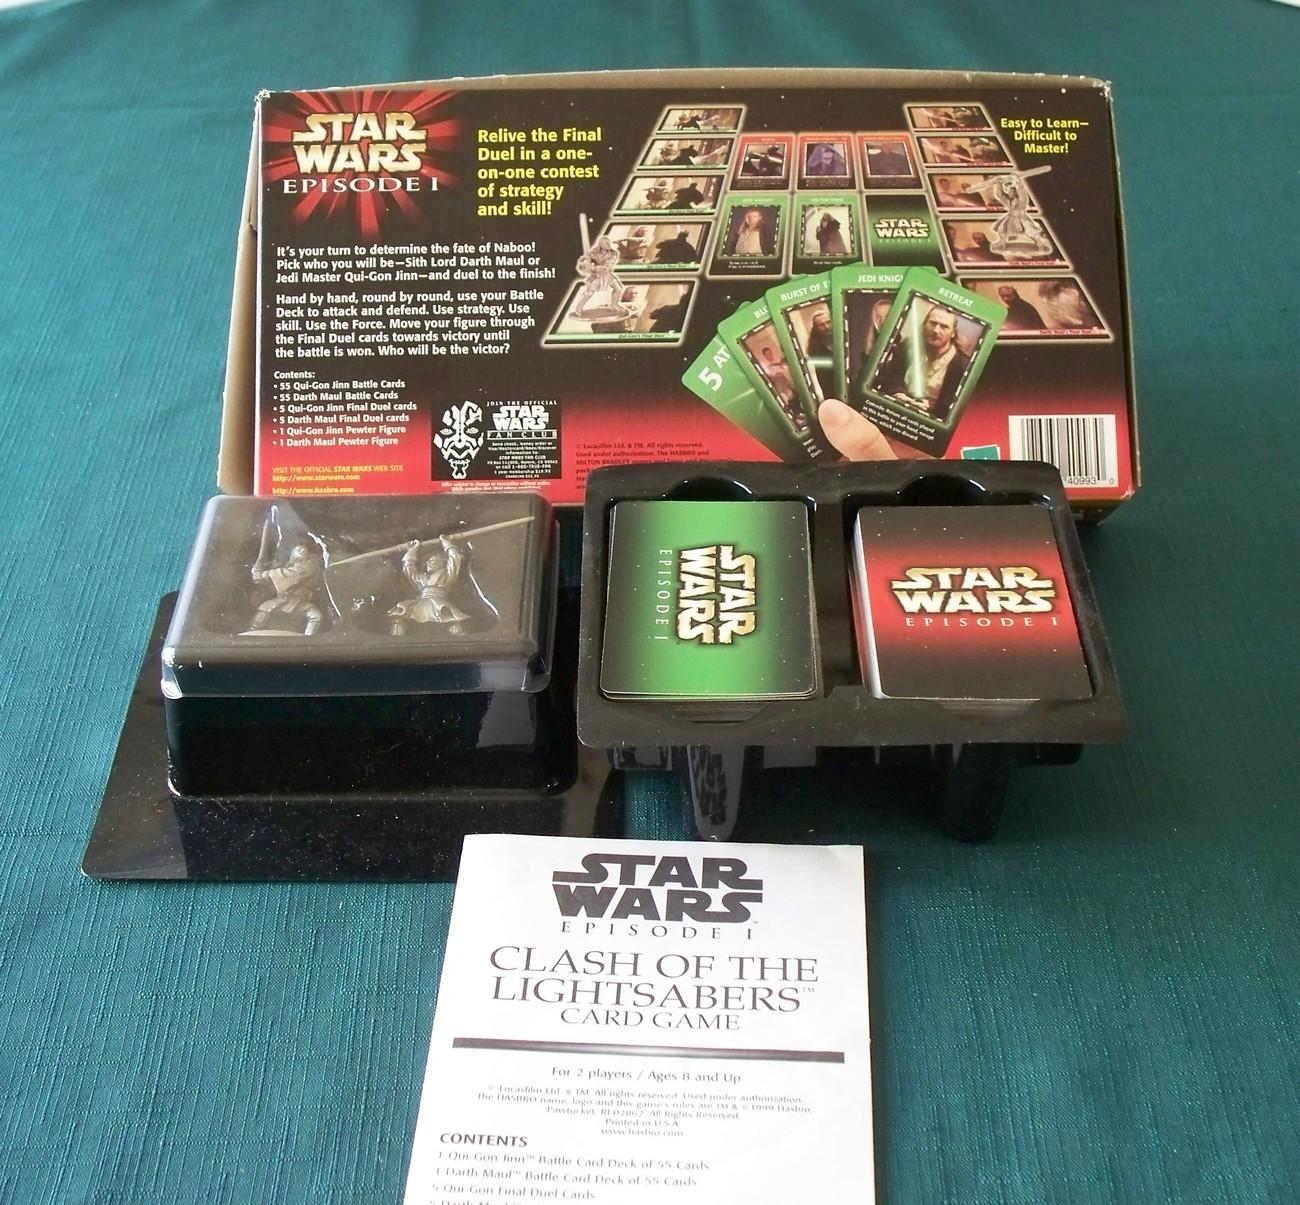 Star Wars Episode I Lightsabers Card Game Complete VGC